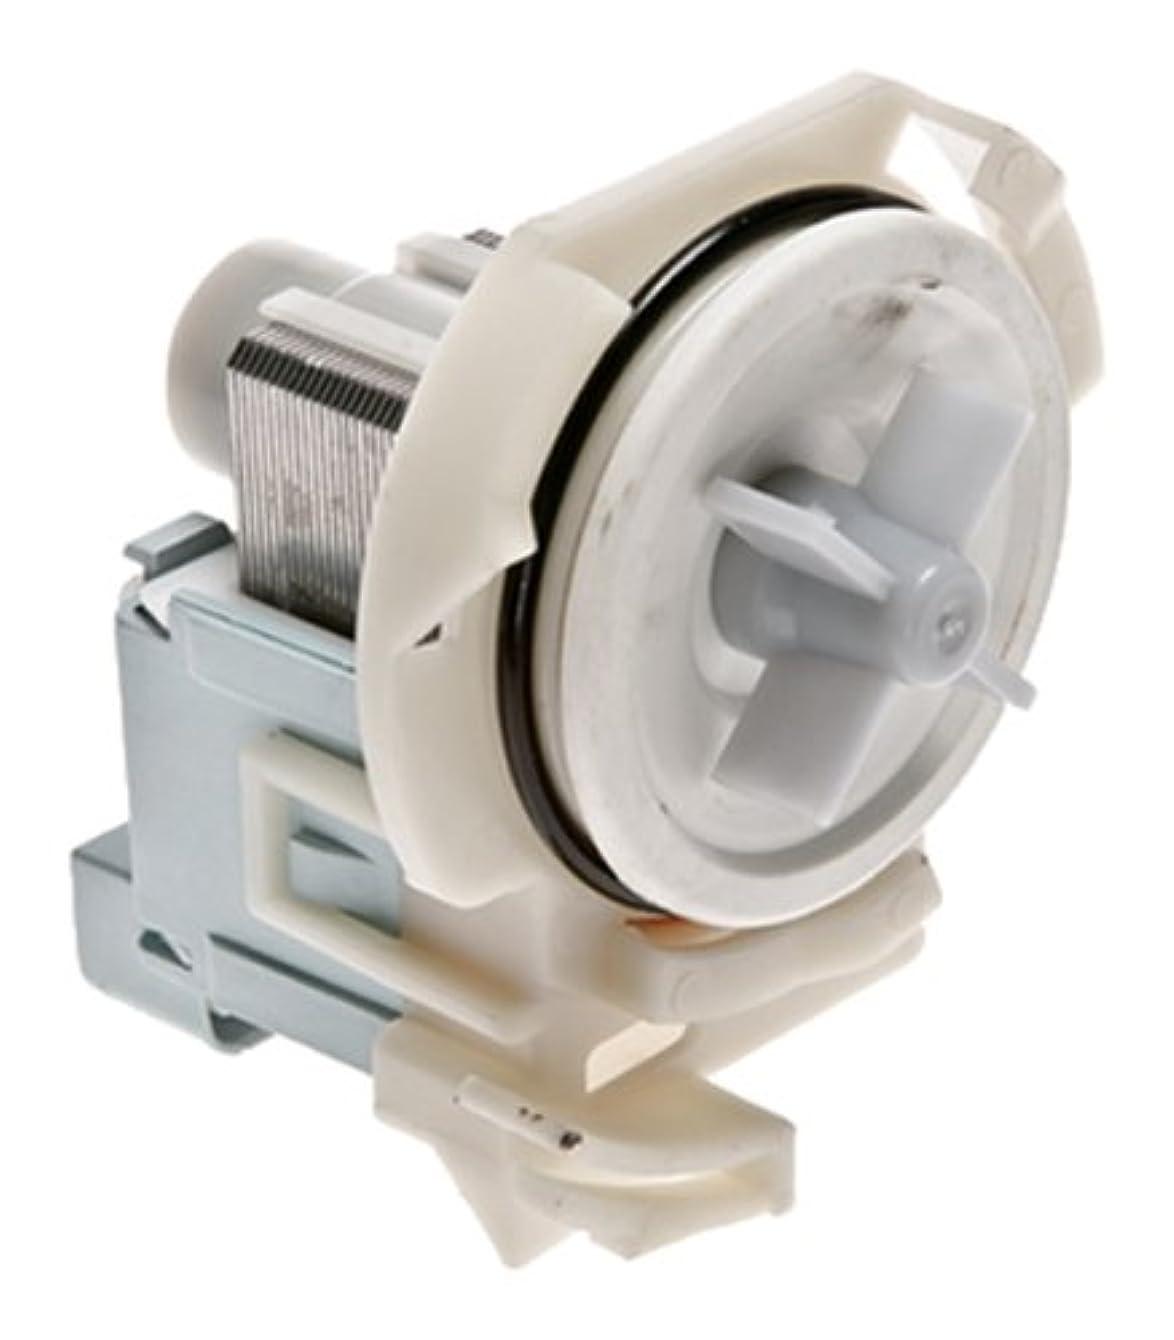 Whirlpool 8558995 Drain Pump for Dish Washer